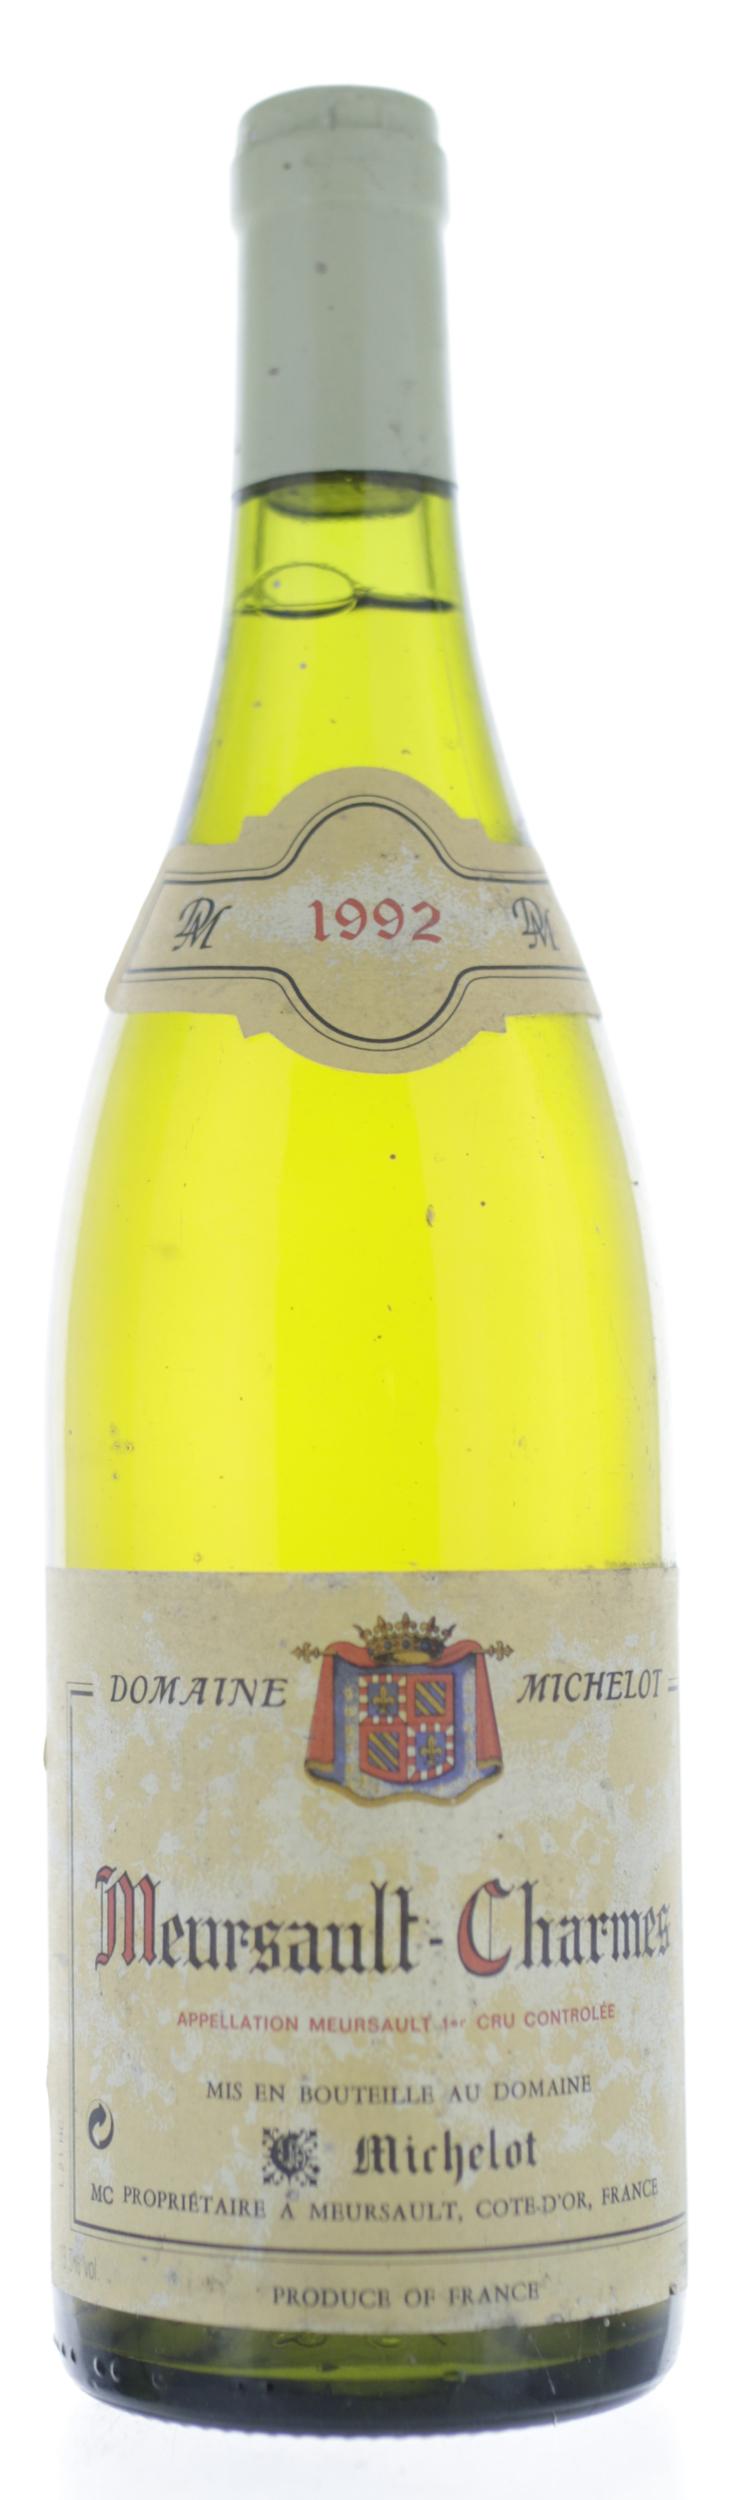 Meursault-Charmes - Domaine Michelot - 1992